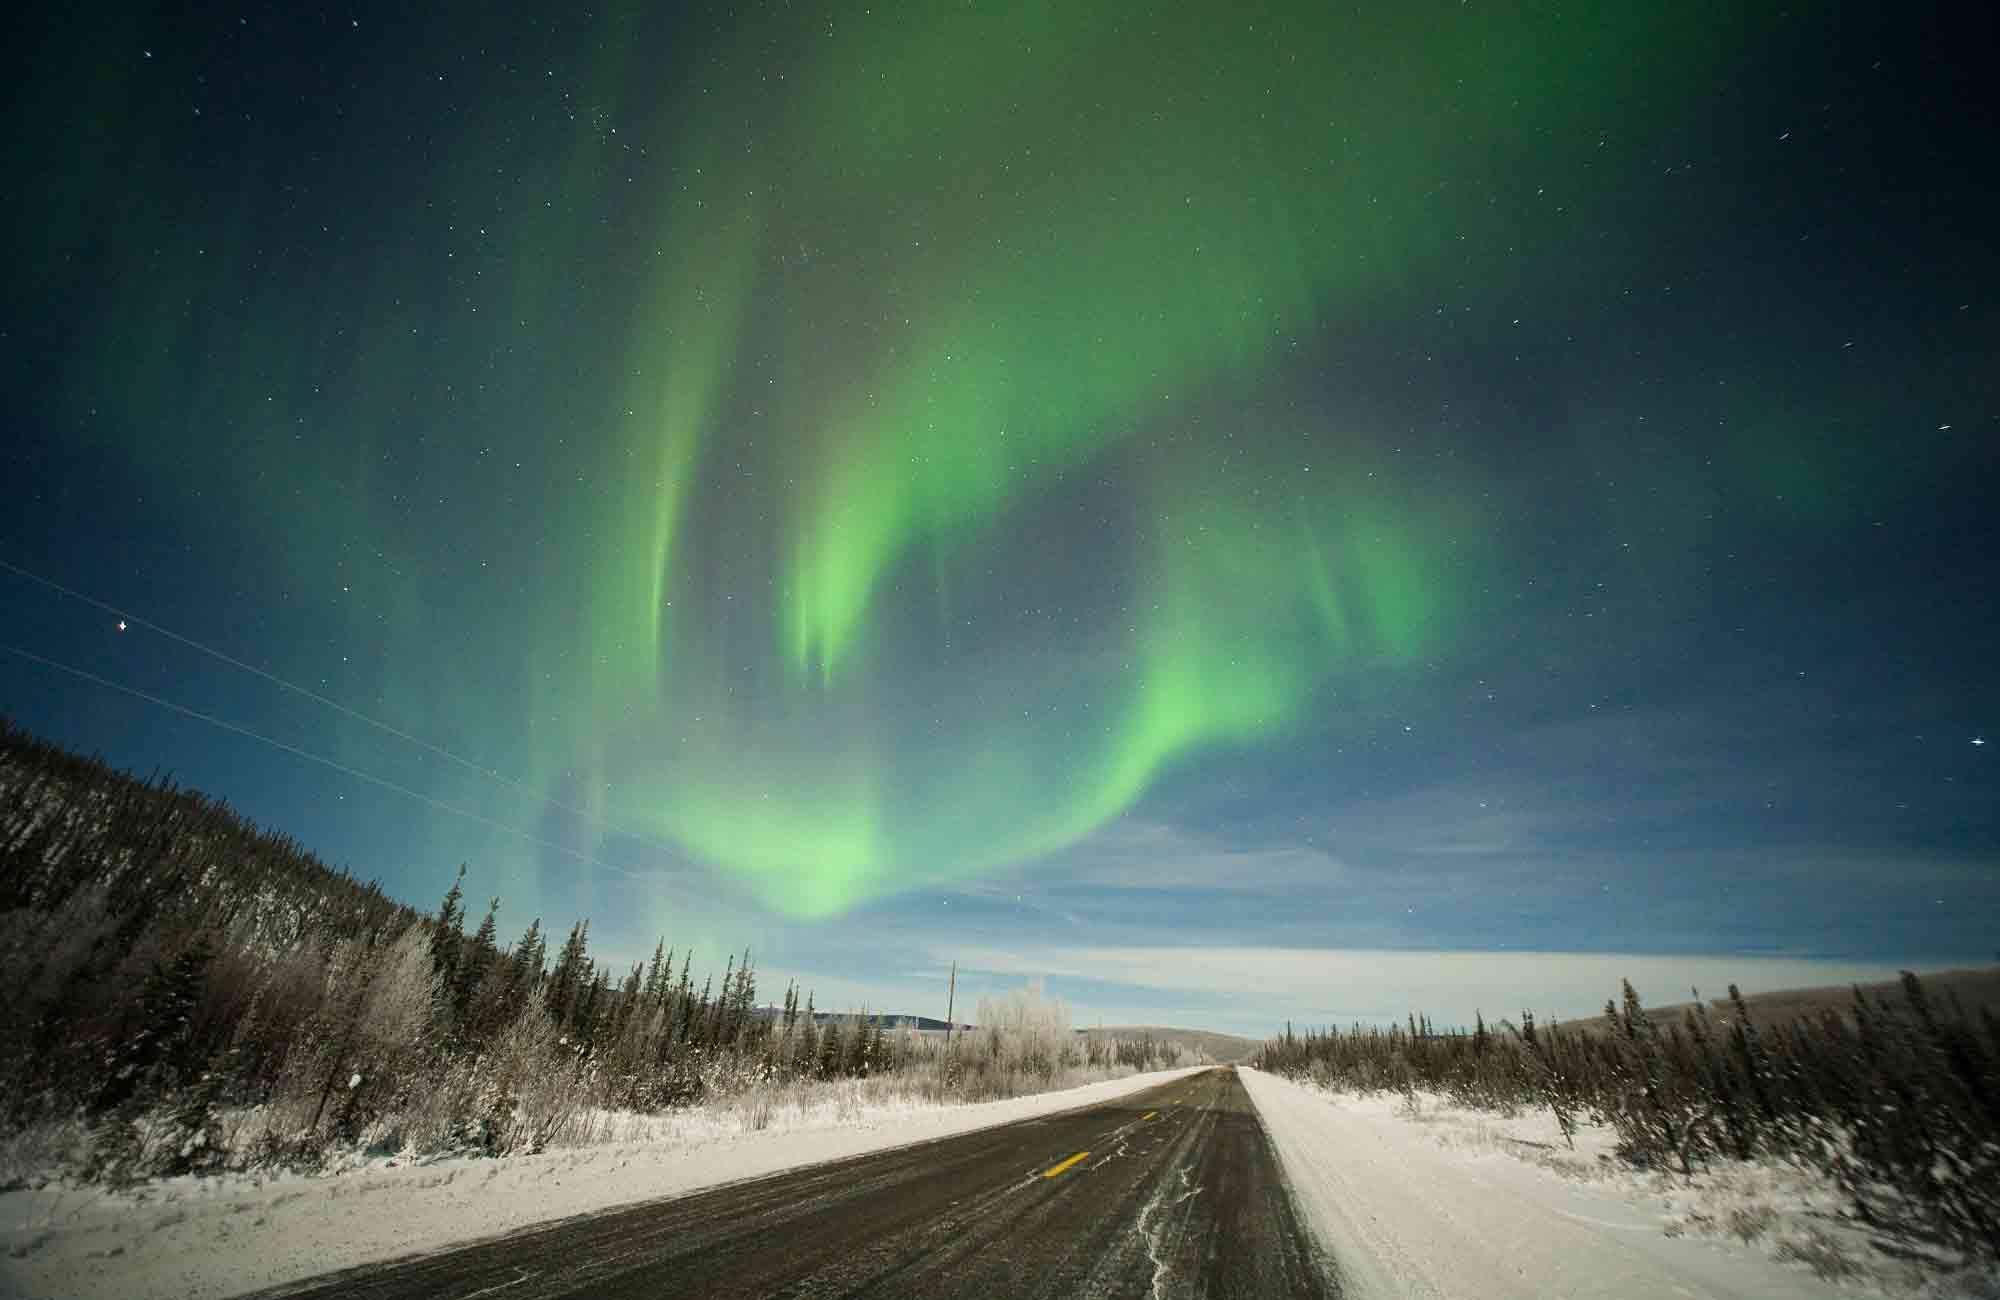 Voyage Alaska - Fairbanks Aurores boréales - Amplitudes